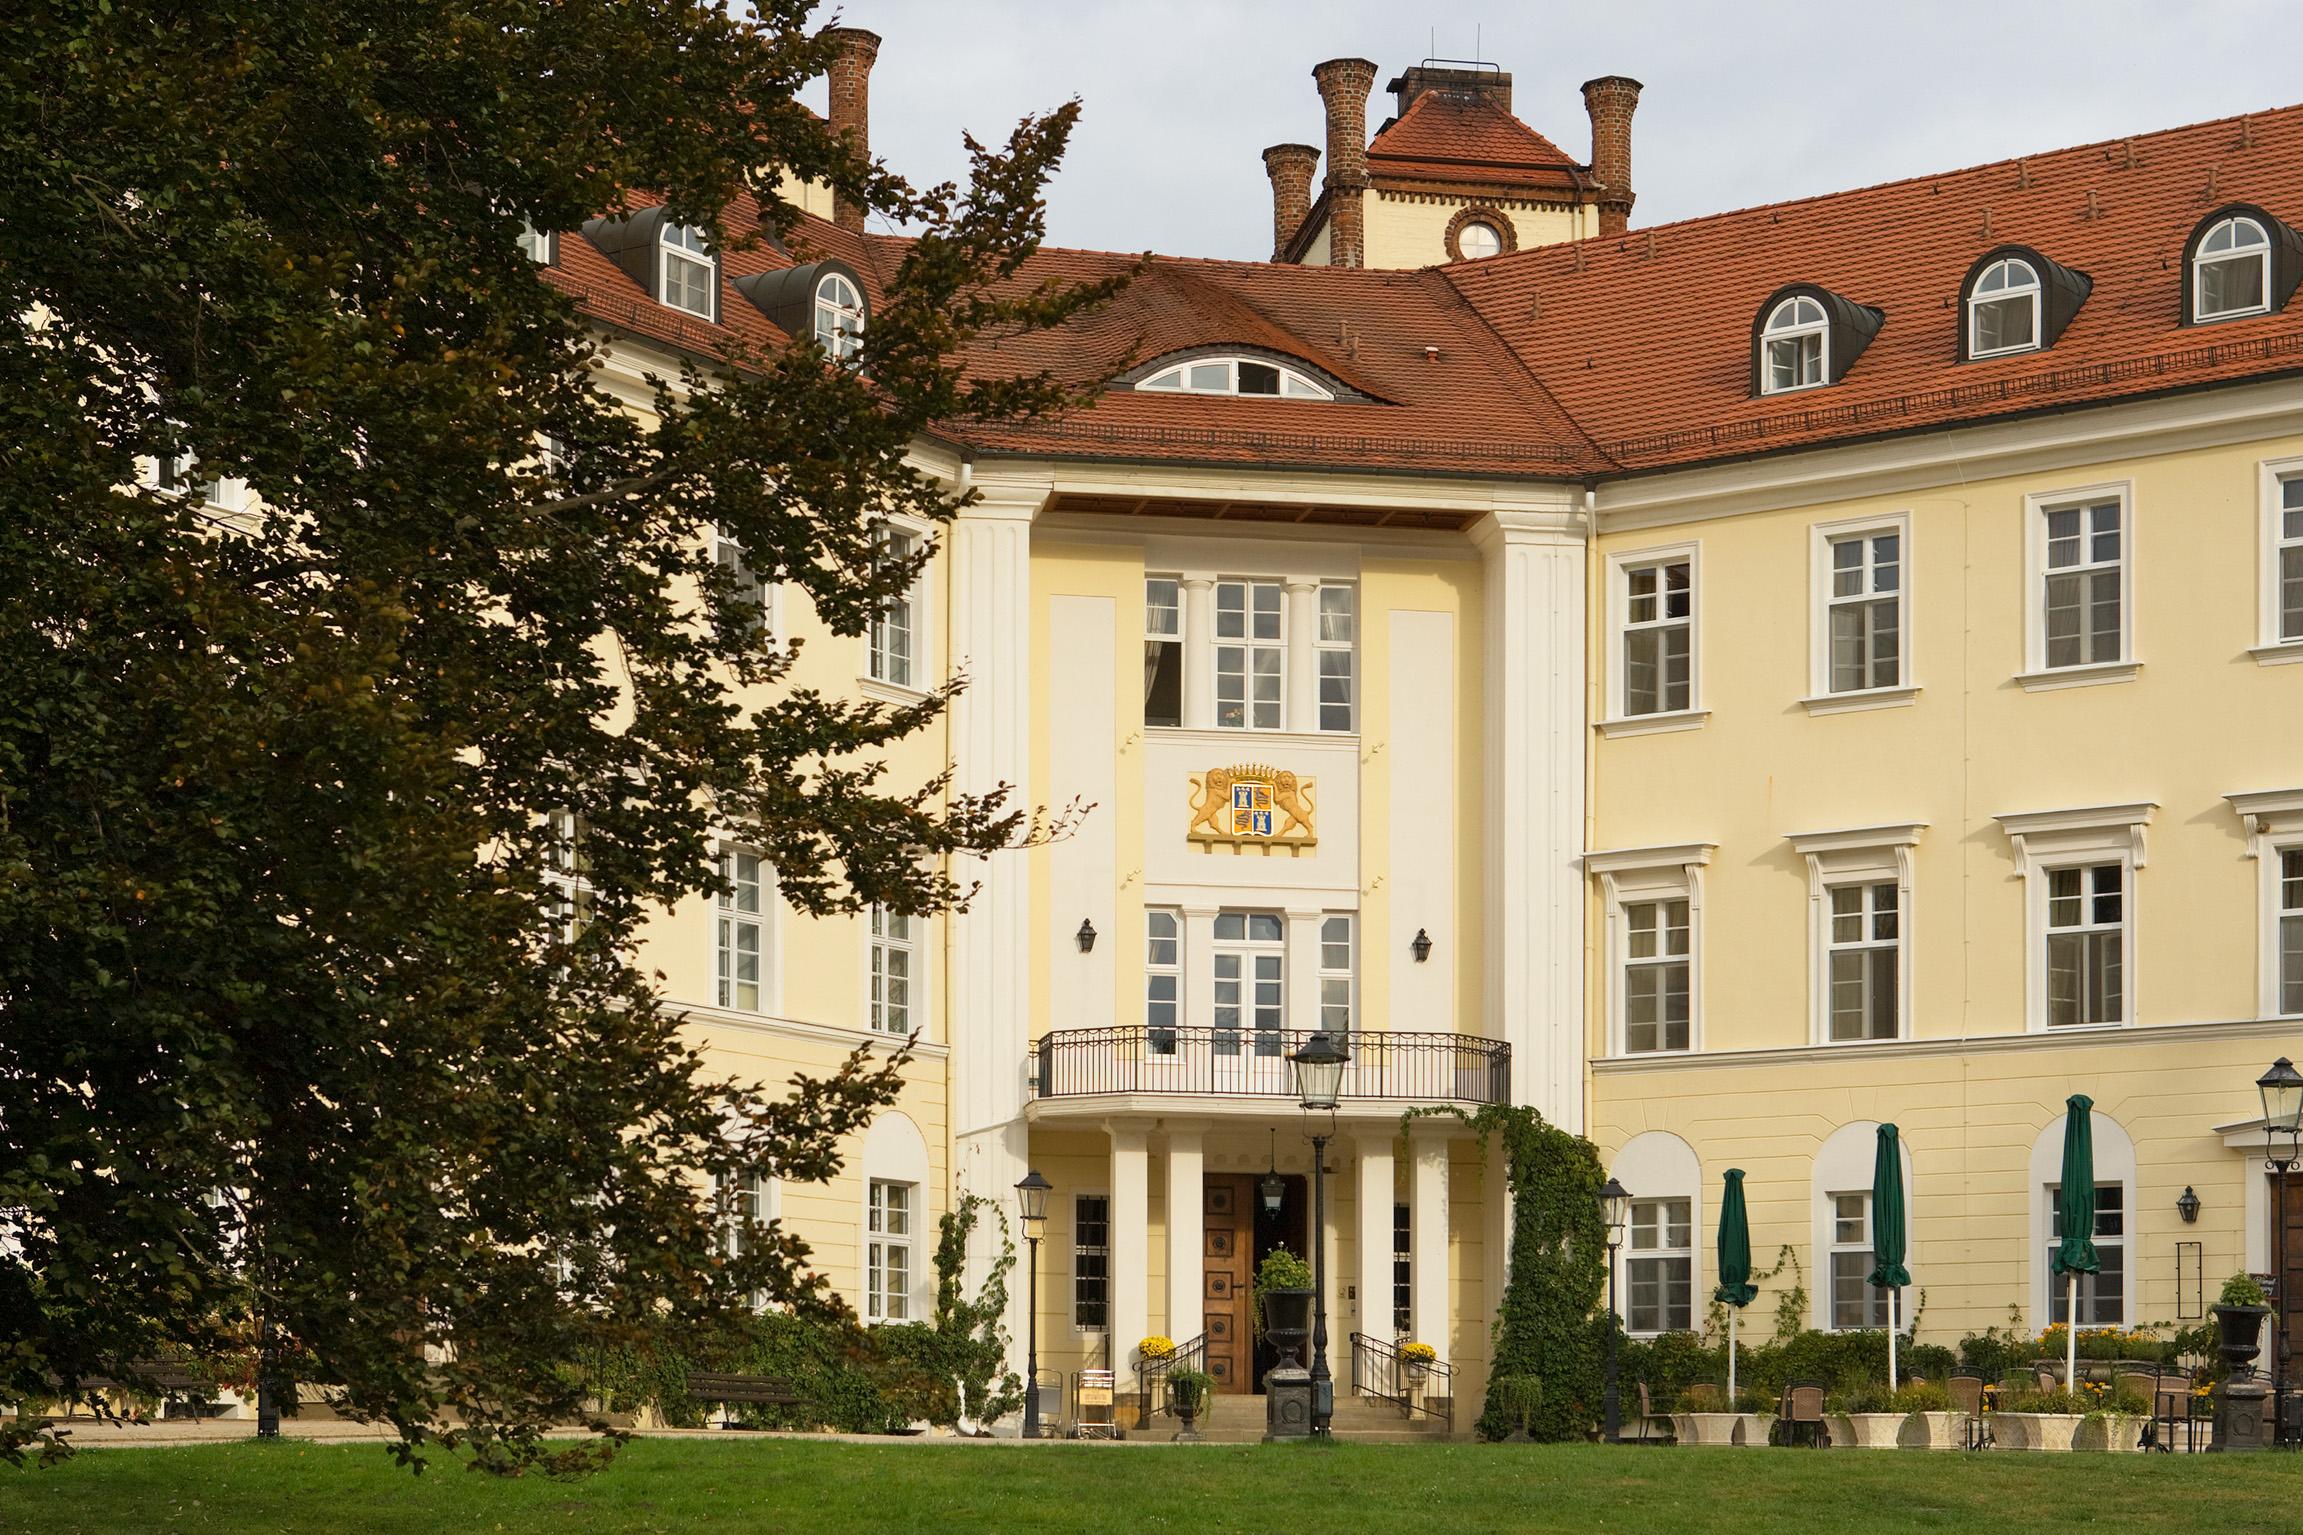 Schloss Lübbenau - Schloss-Hotel - Spreewald - Lübbenau